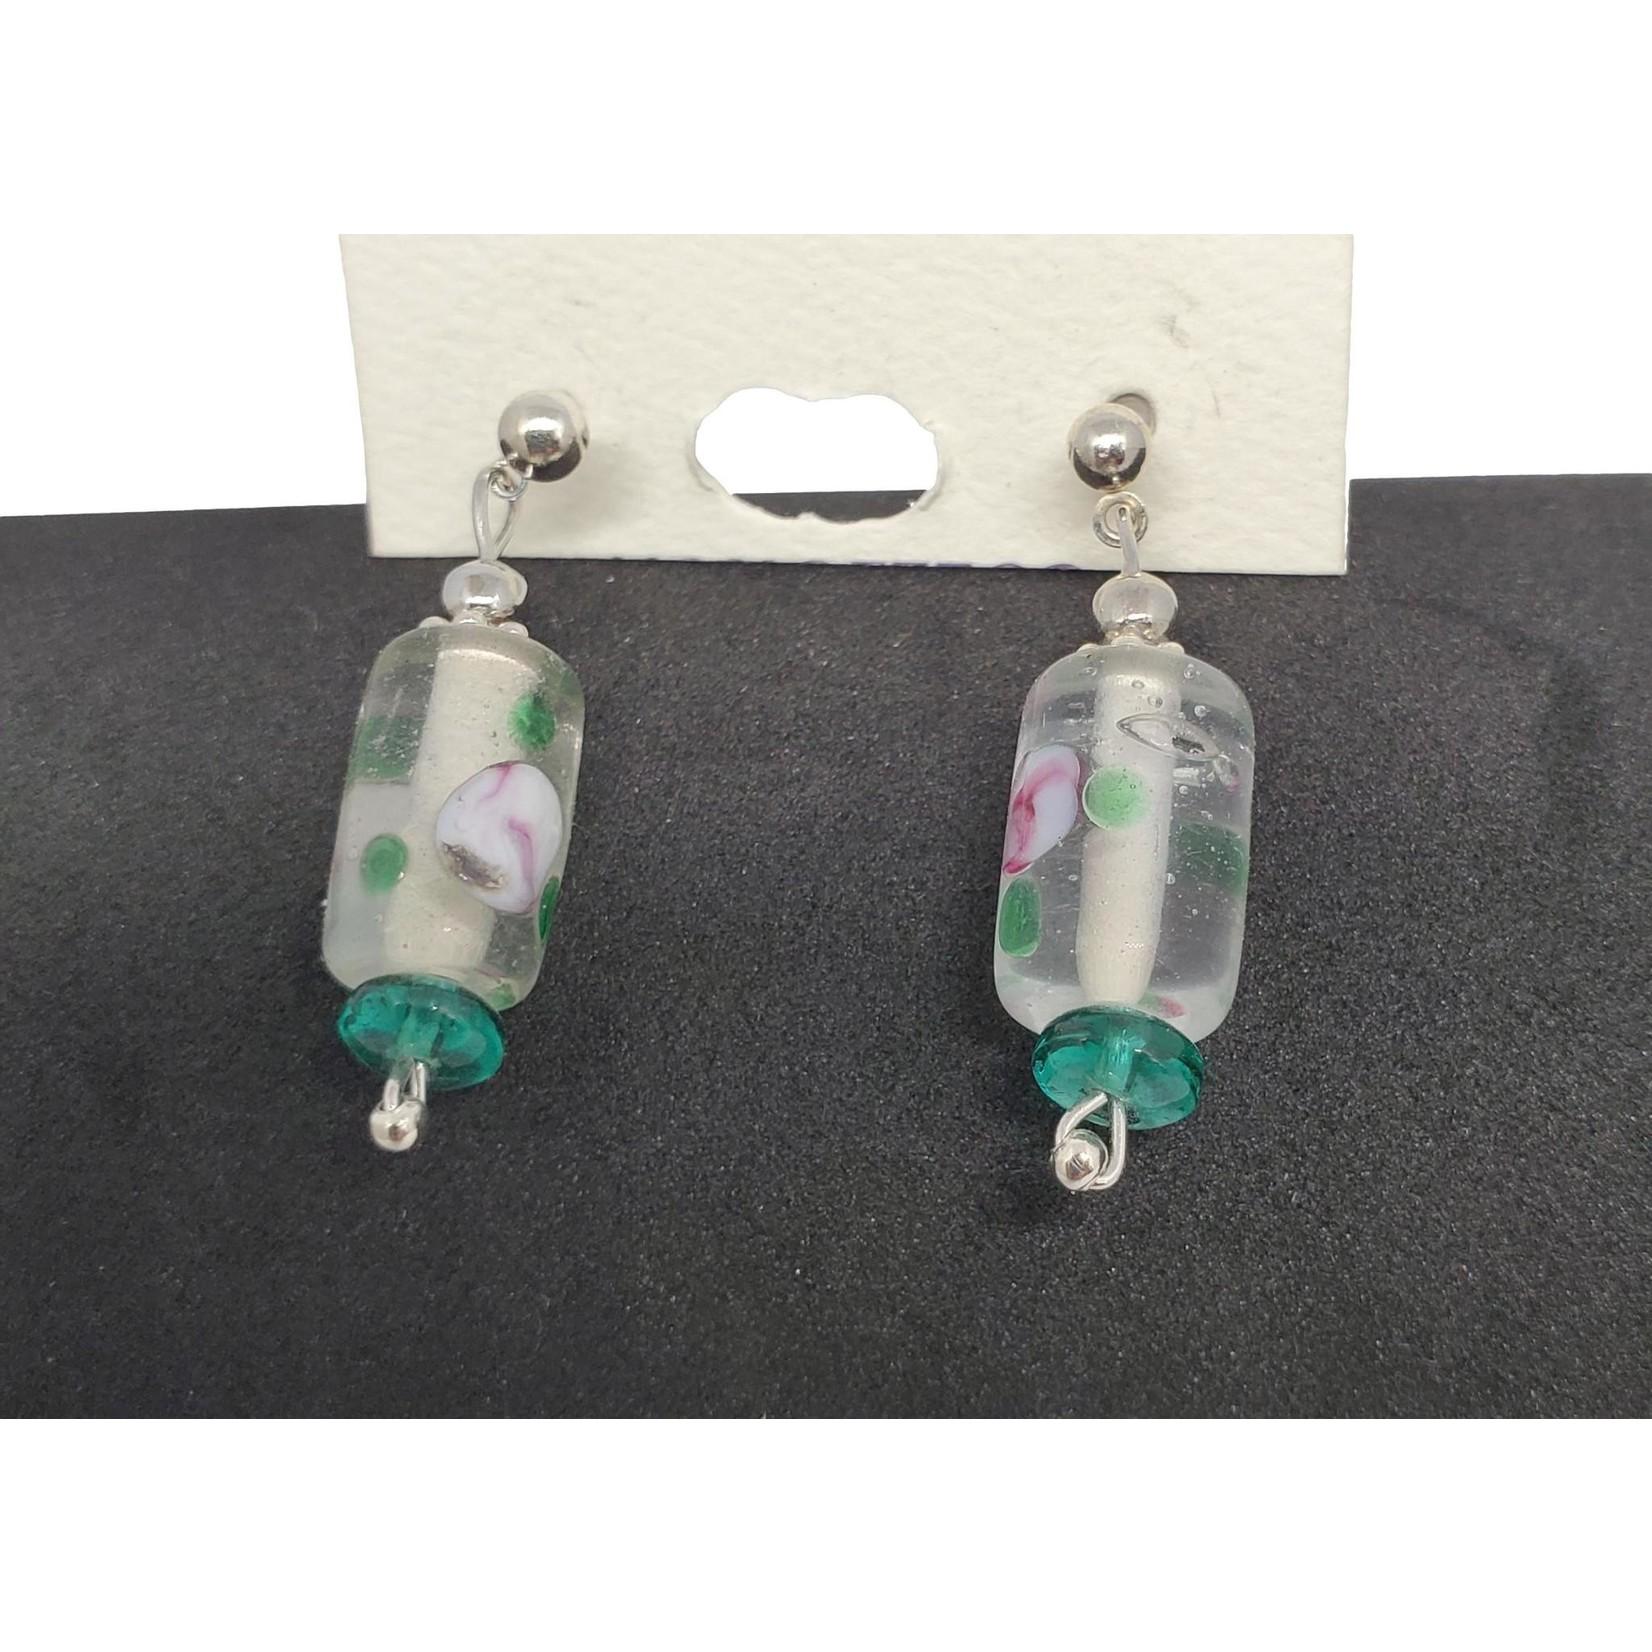 Jewellery by Deborah Young-Groves Painted Glass Drop Earrings